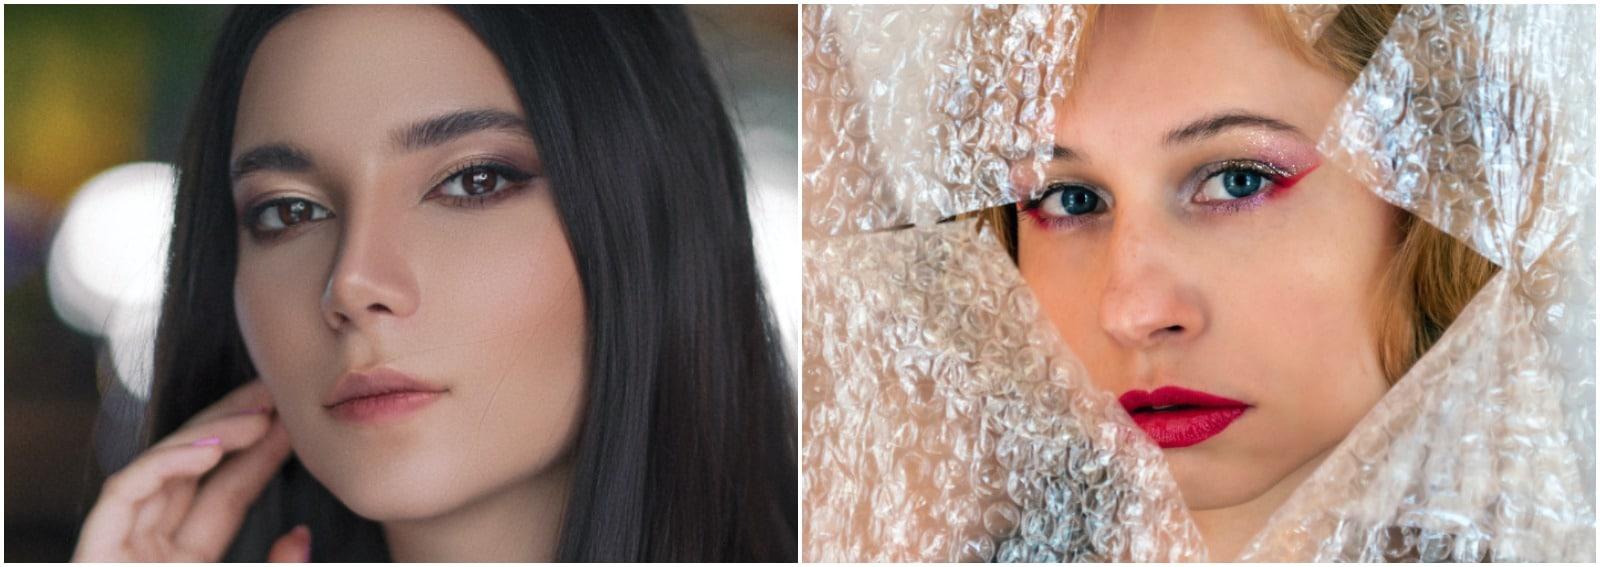 reverse eyeiner trucco occhi al contrario cover desktop